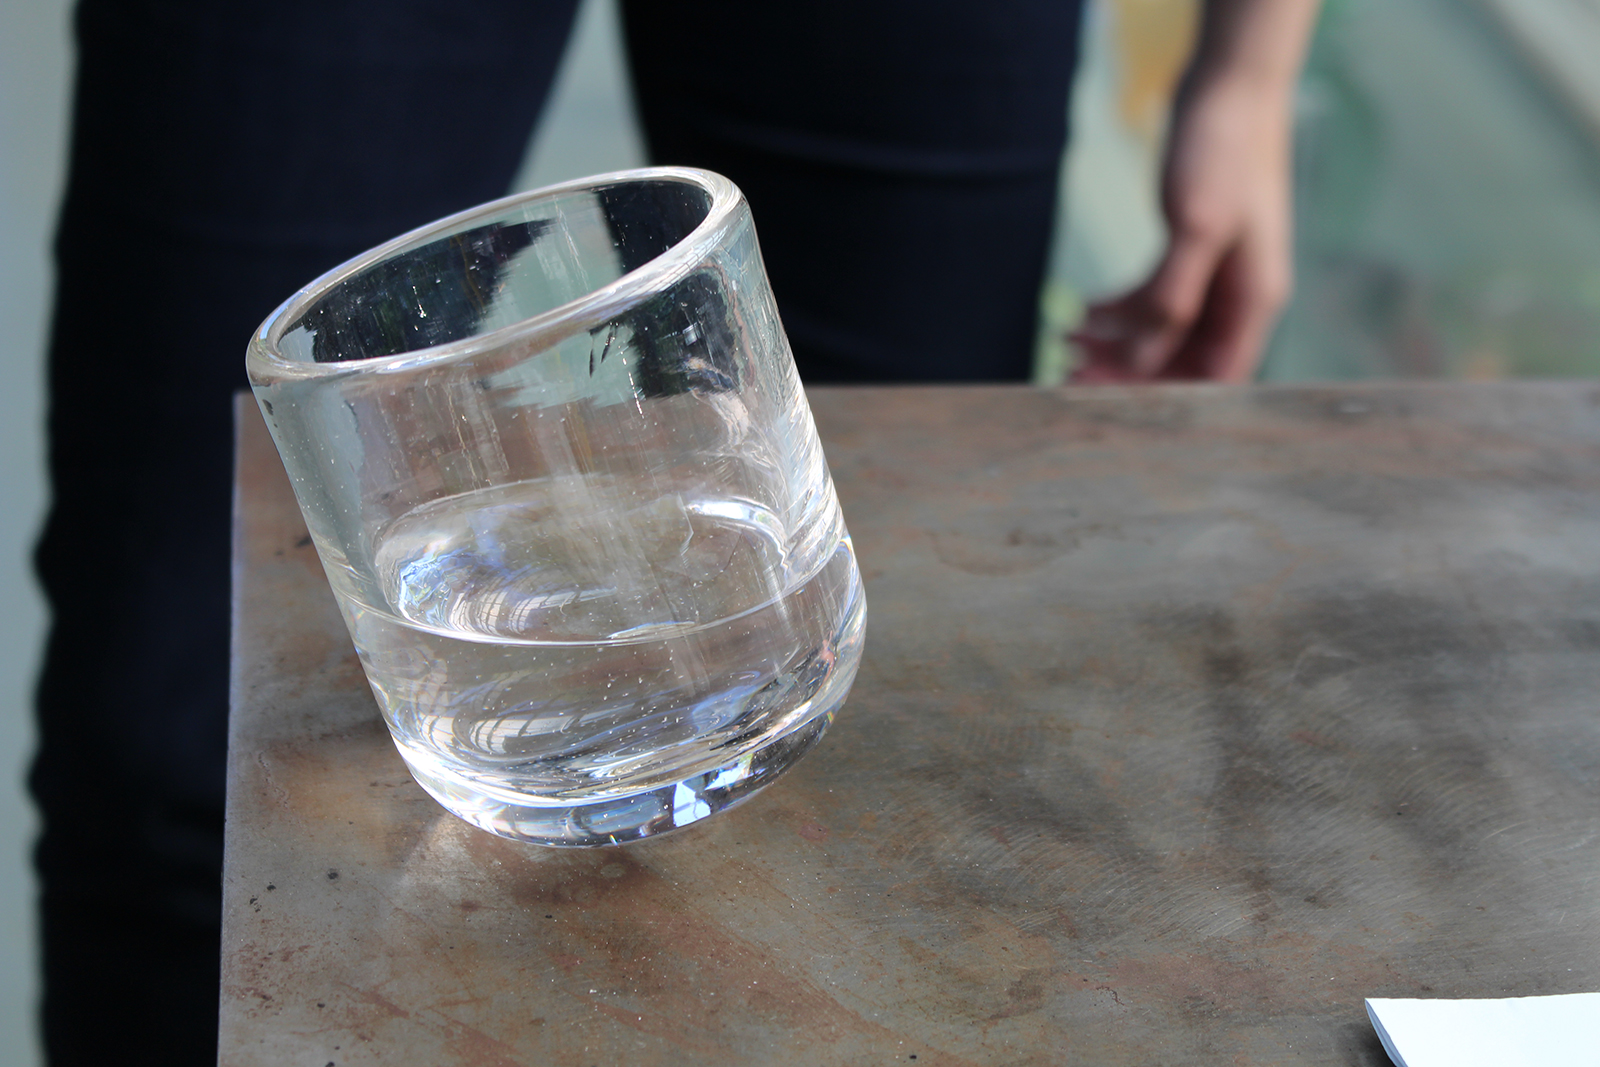 Whiskey glass design by GlassLab Fellowship recipient Bridget Sheehan